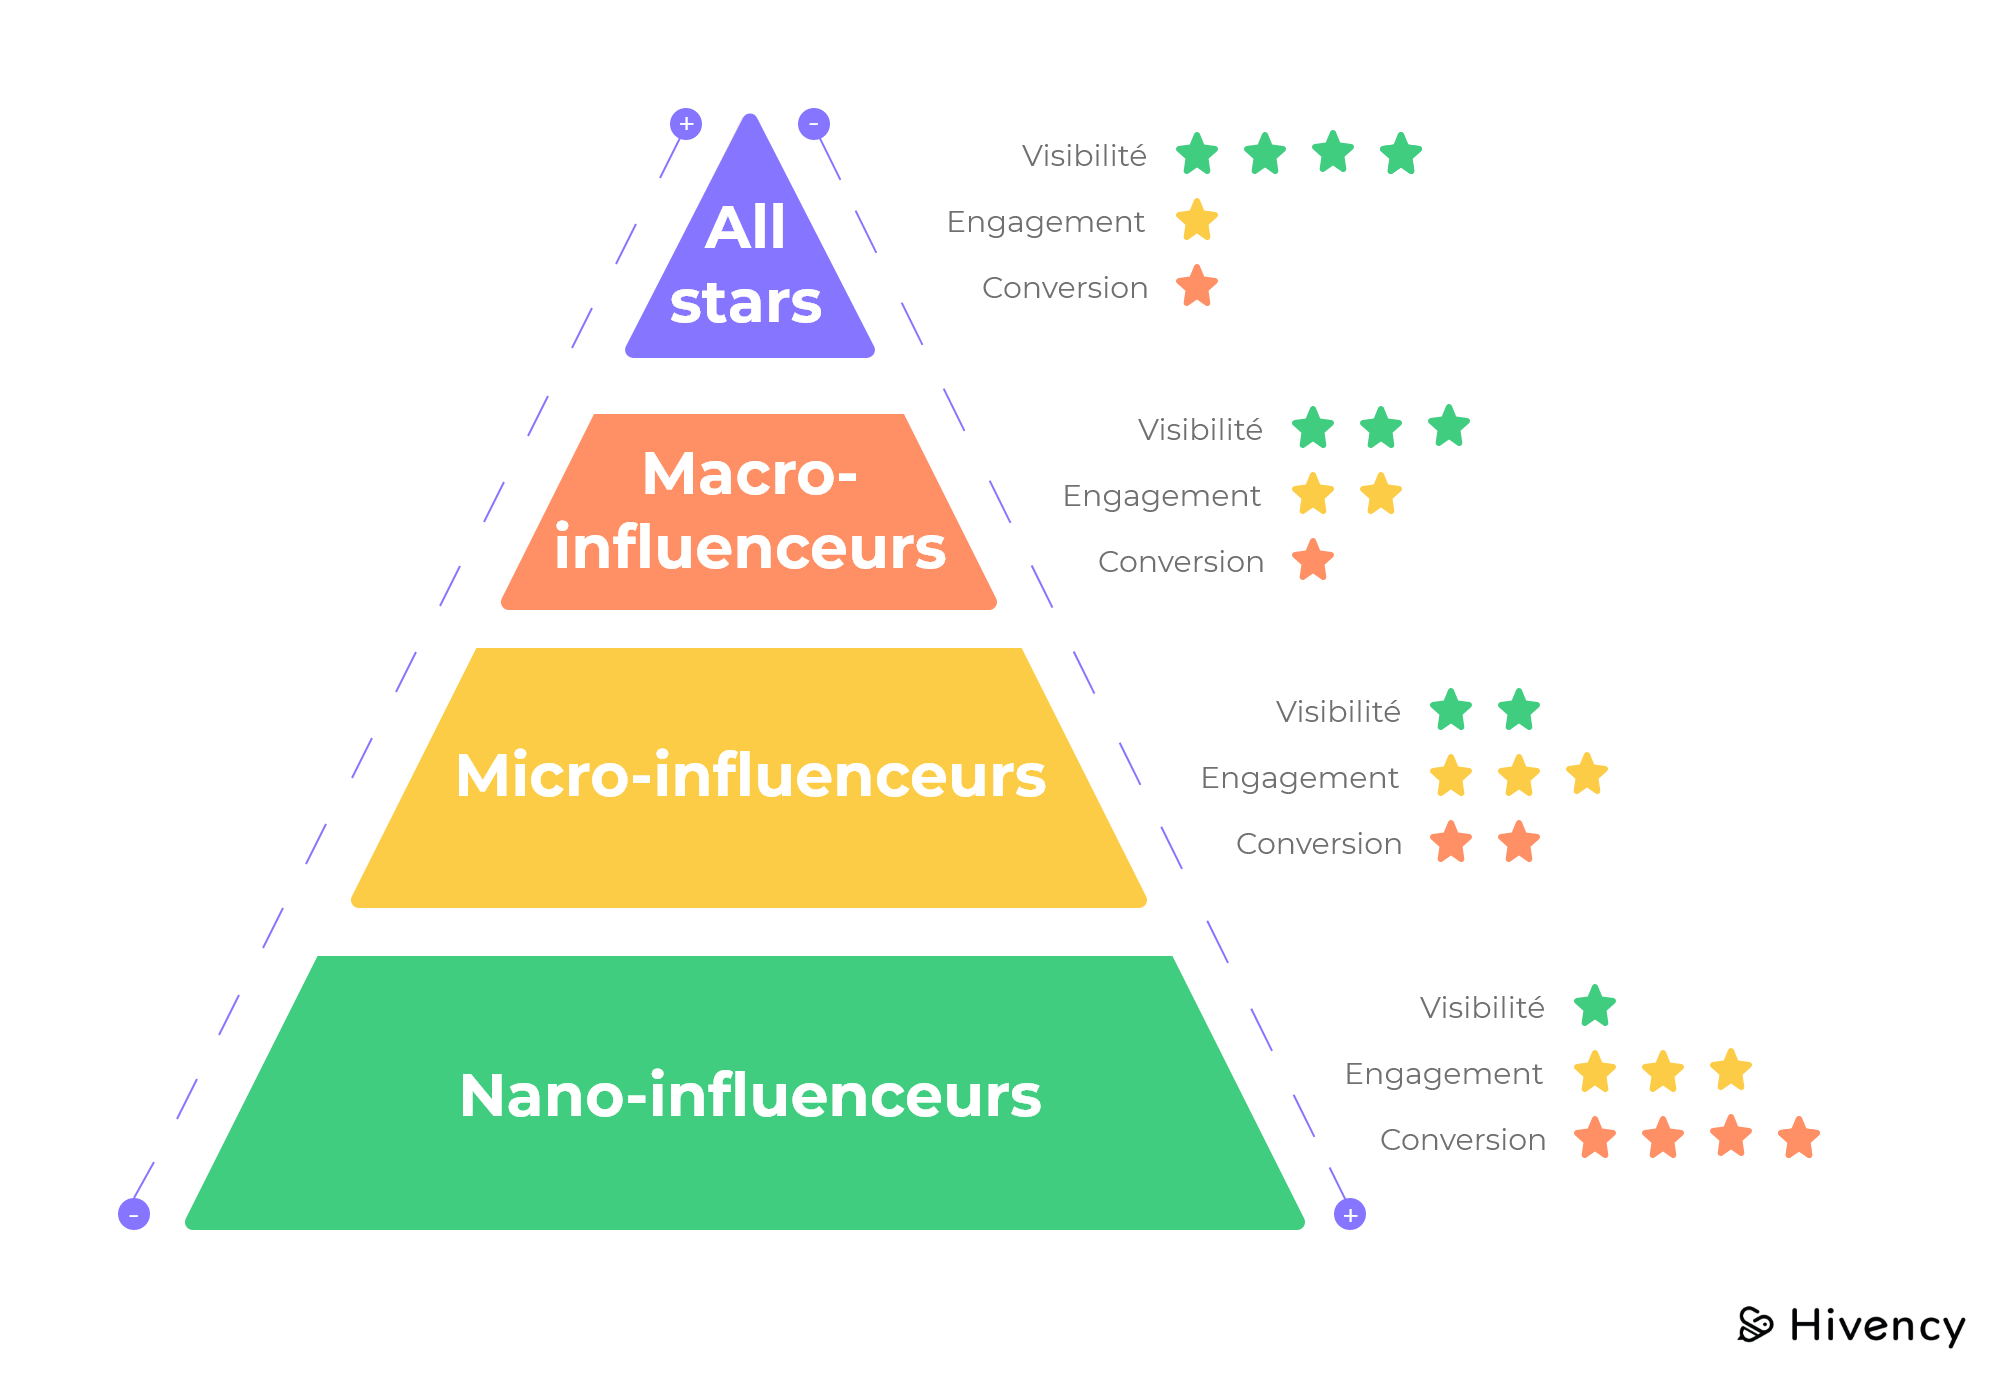 FR - Influence marketing pyramid@2x